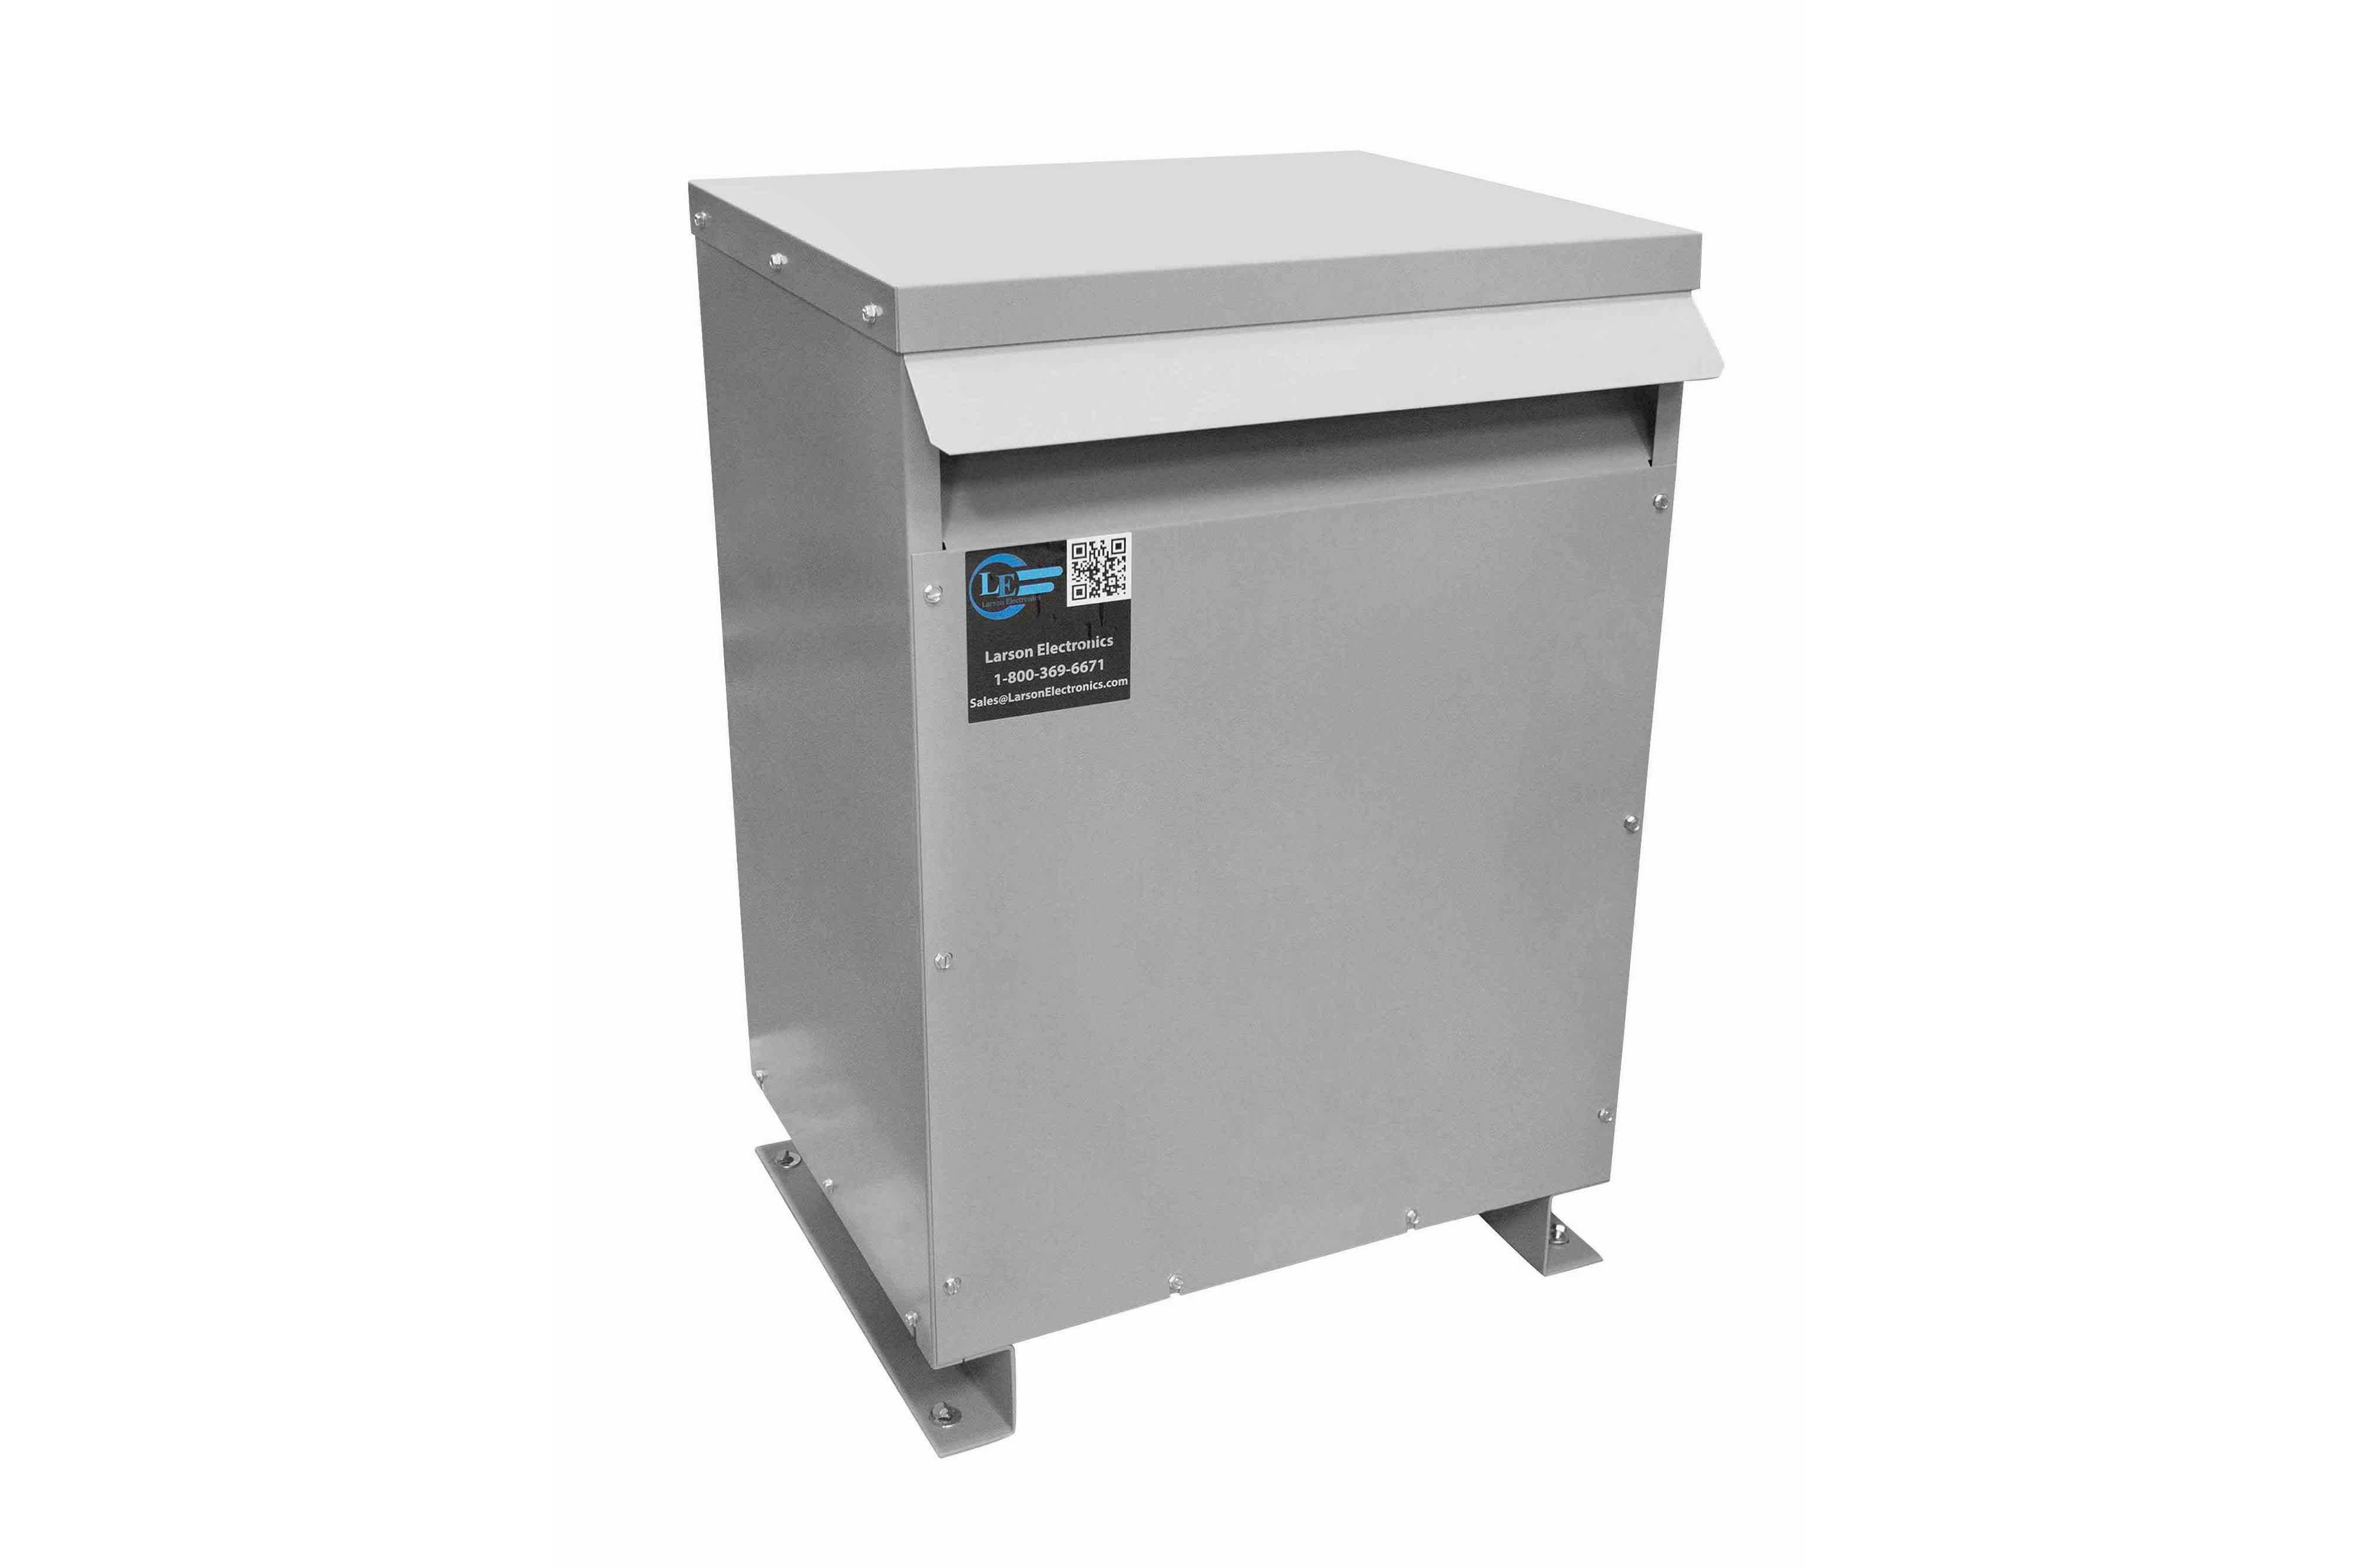 1000 kVA 3PH Isolation Transformer, 440V Wye Primary, 208Y/120 Wye-N Secondary, N3R, Ventilated, 60 Hz